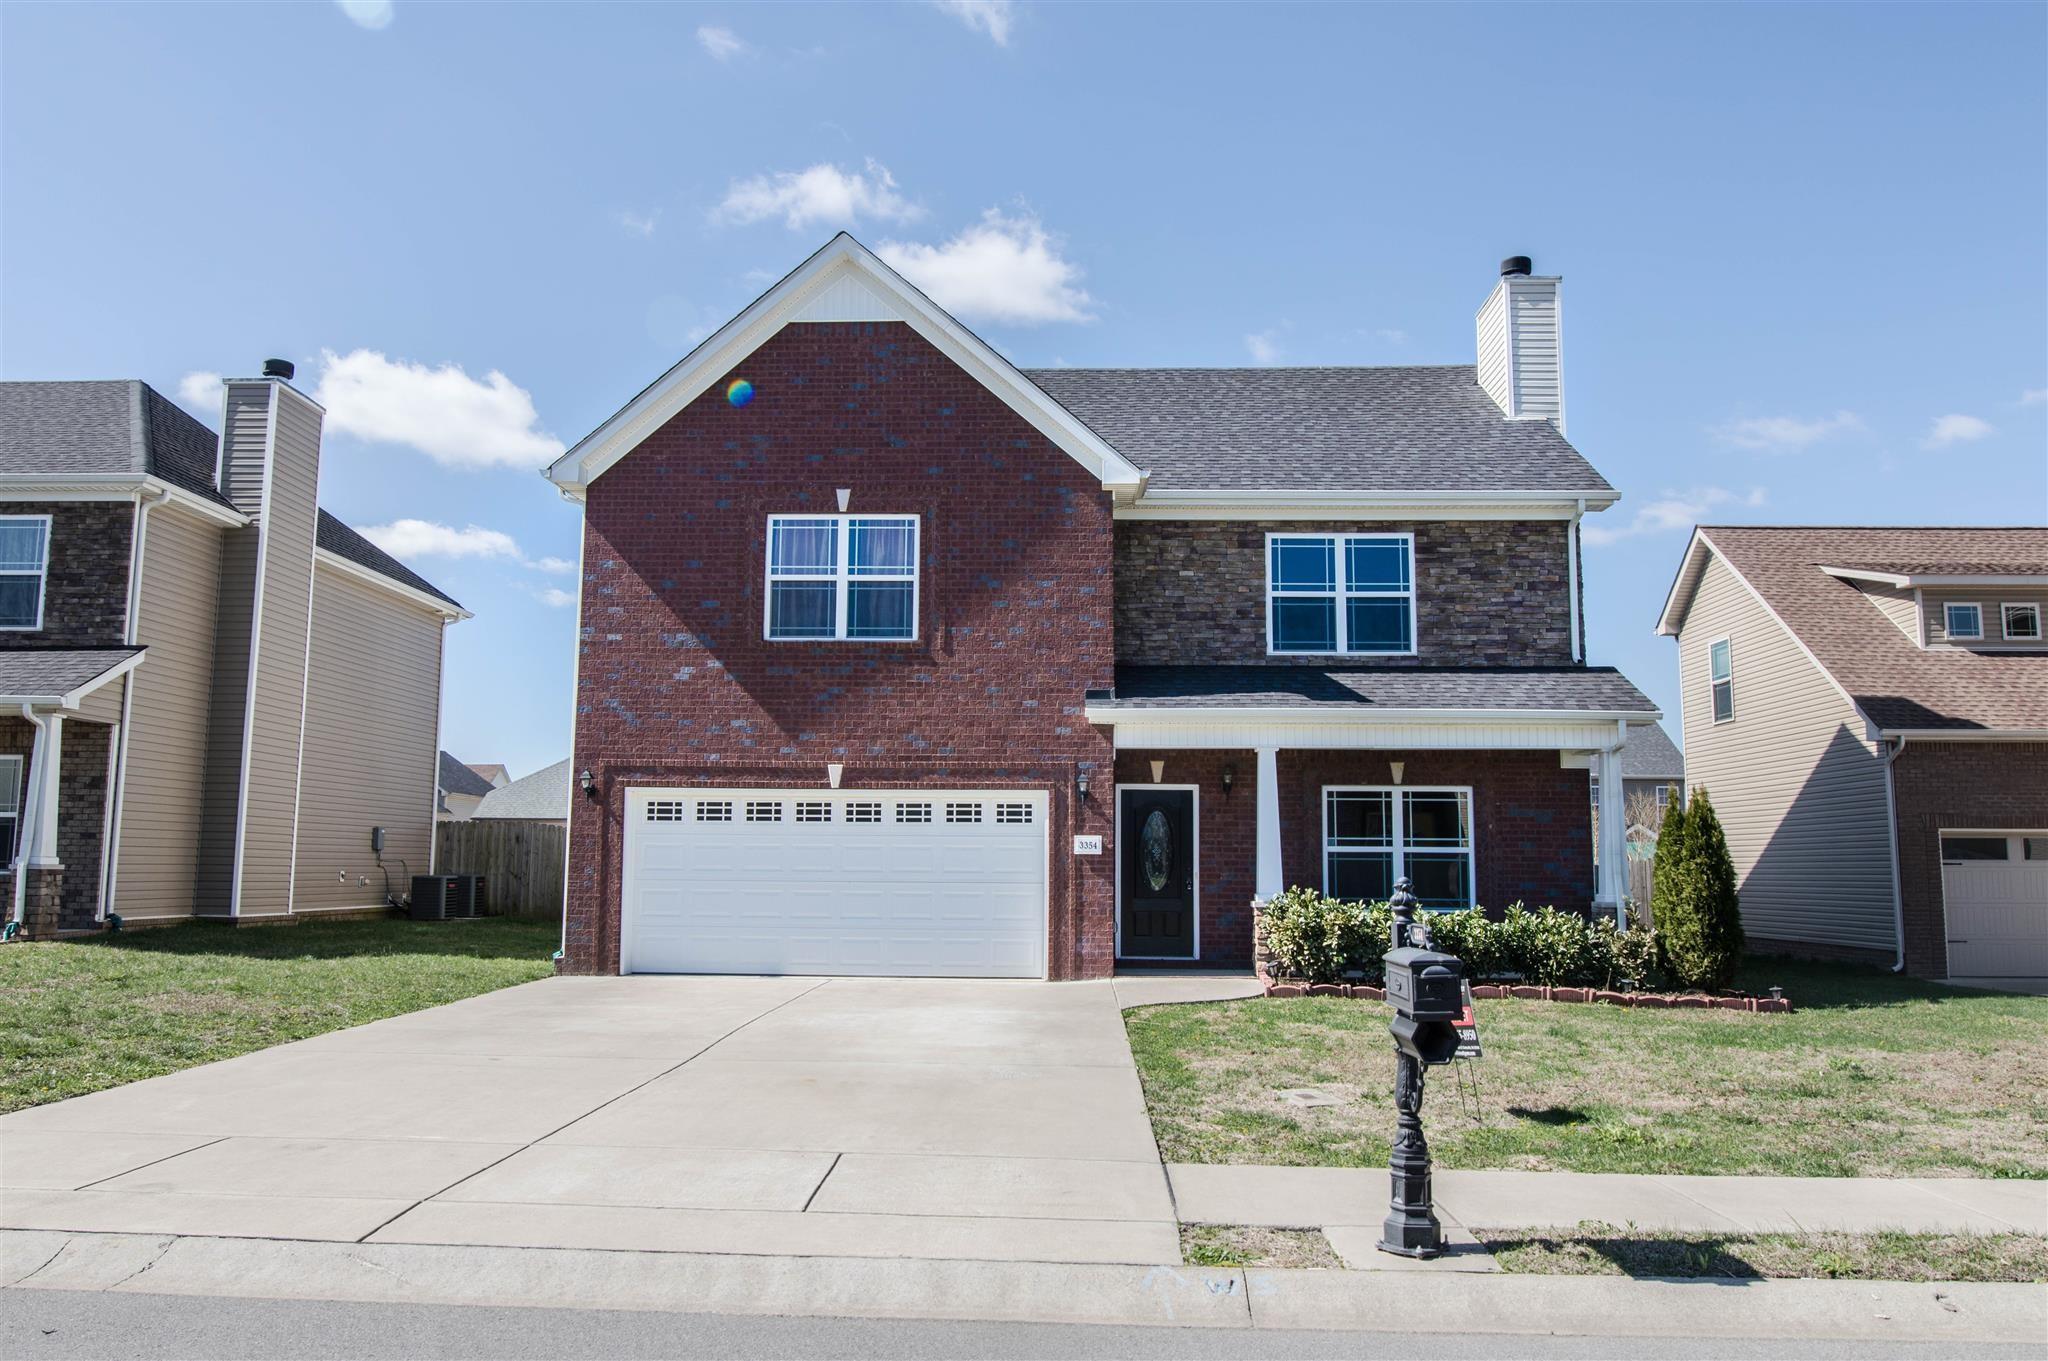 3354 Cotham Ln, Clarksville, TN 37042 - Clarksville, TN real estate listing